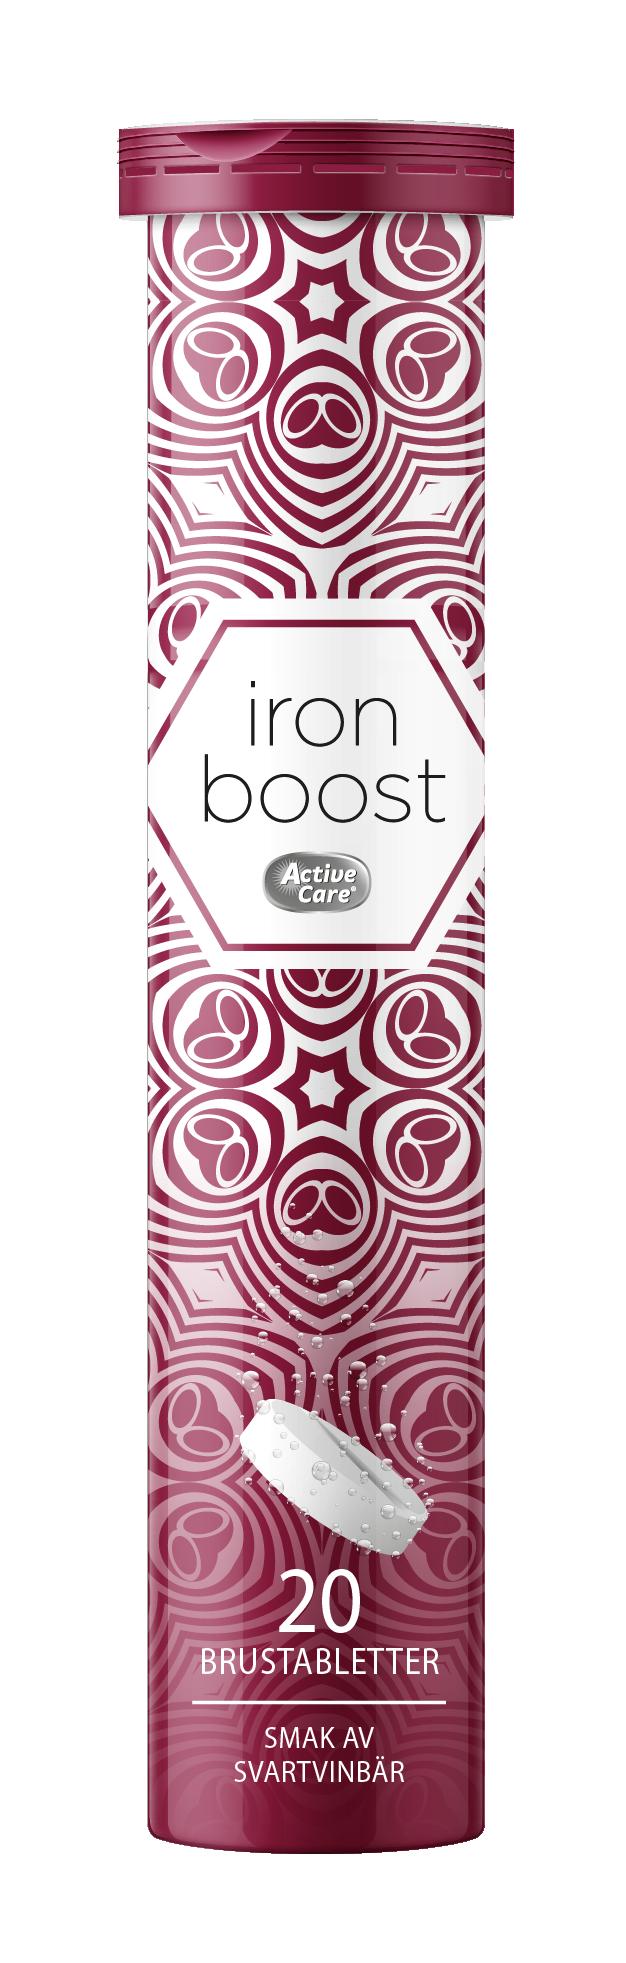 Iron_Boost_SVERIGE_3D